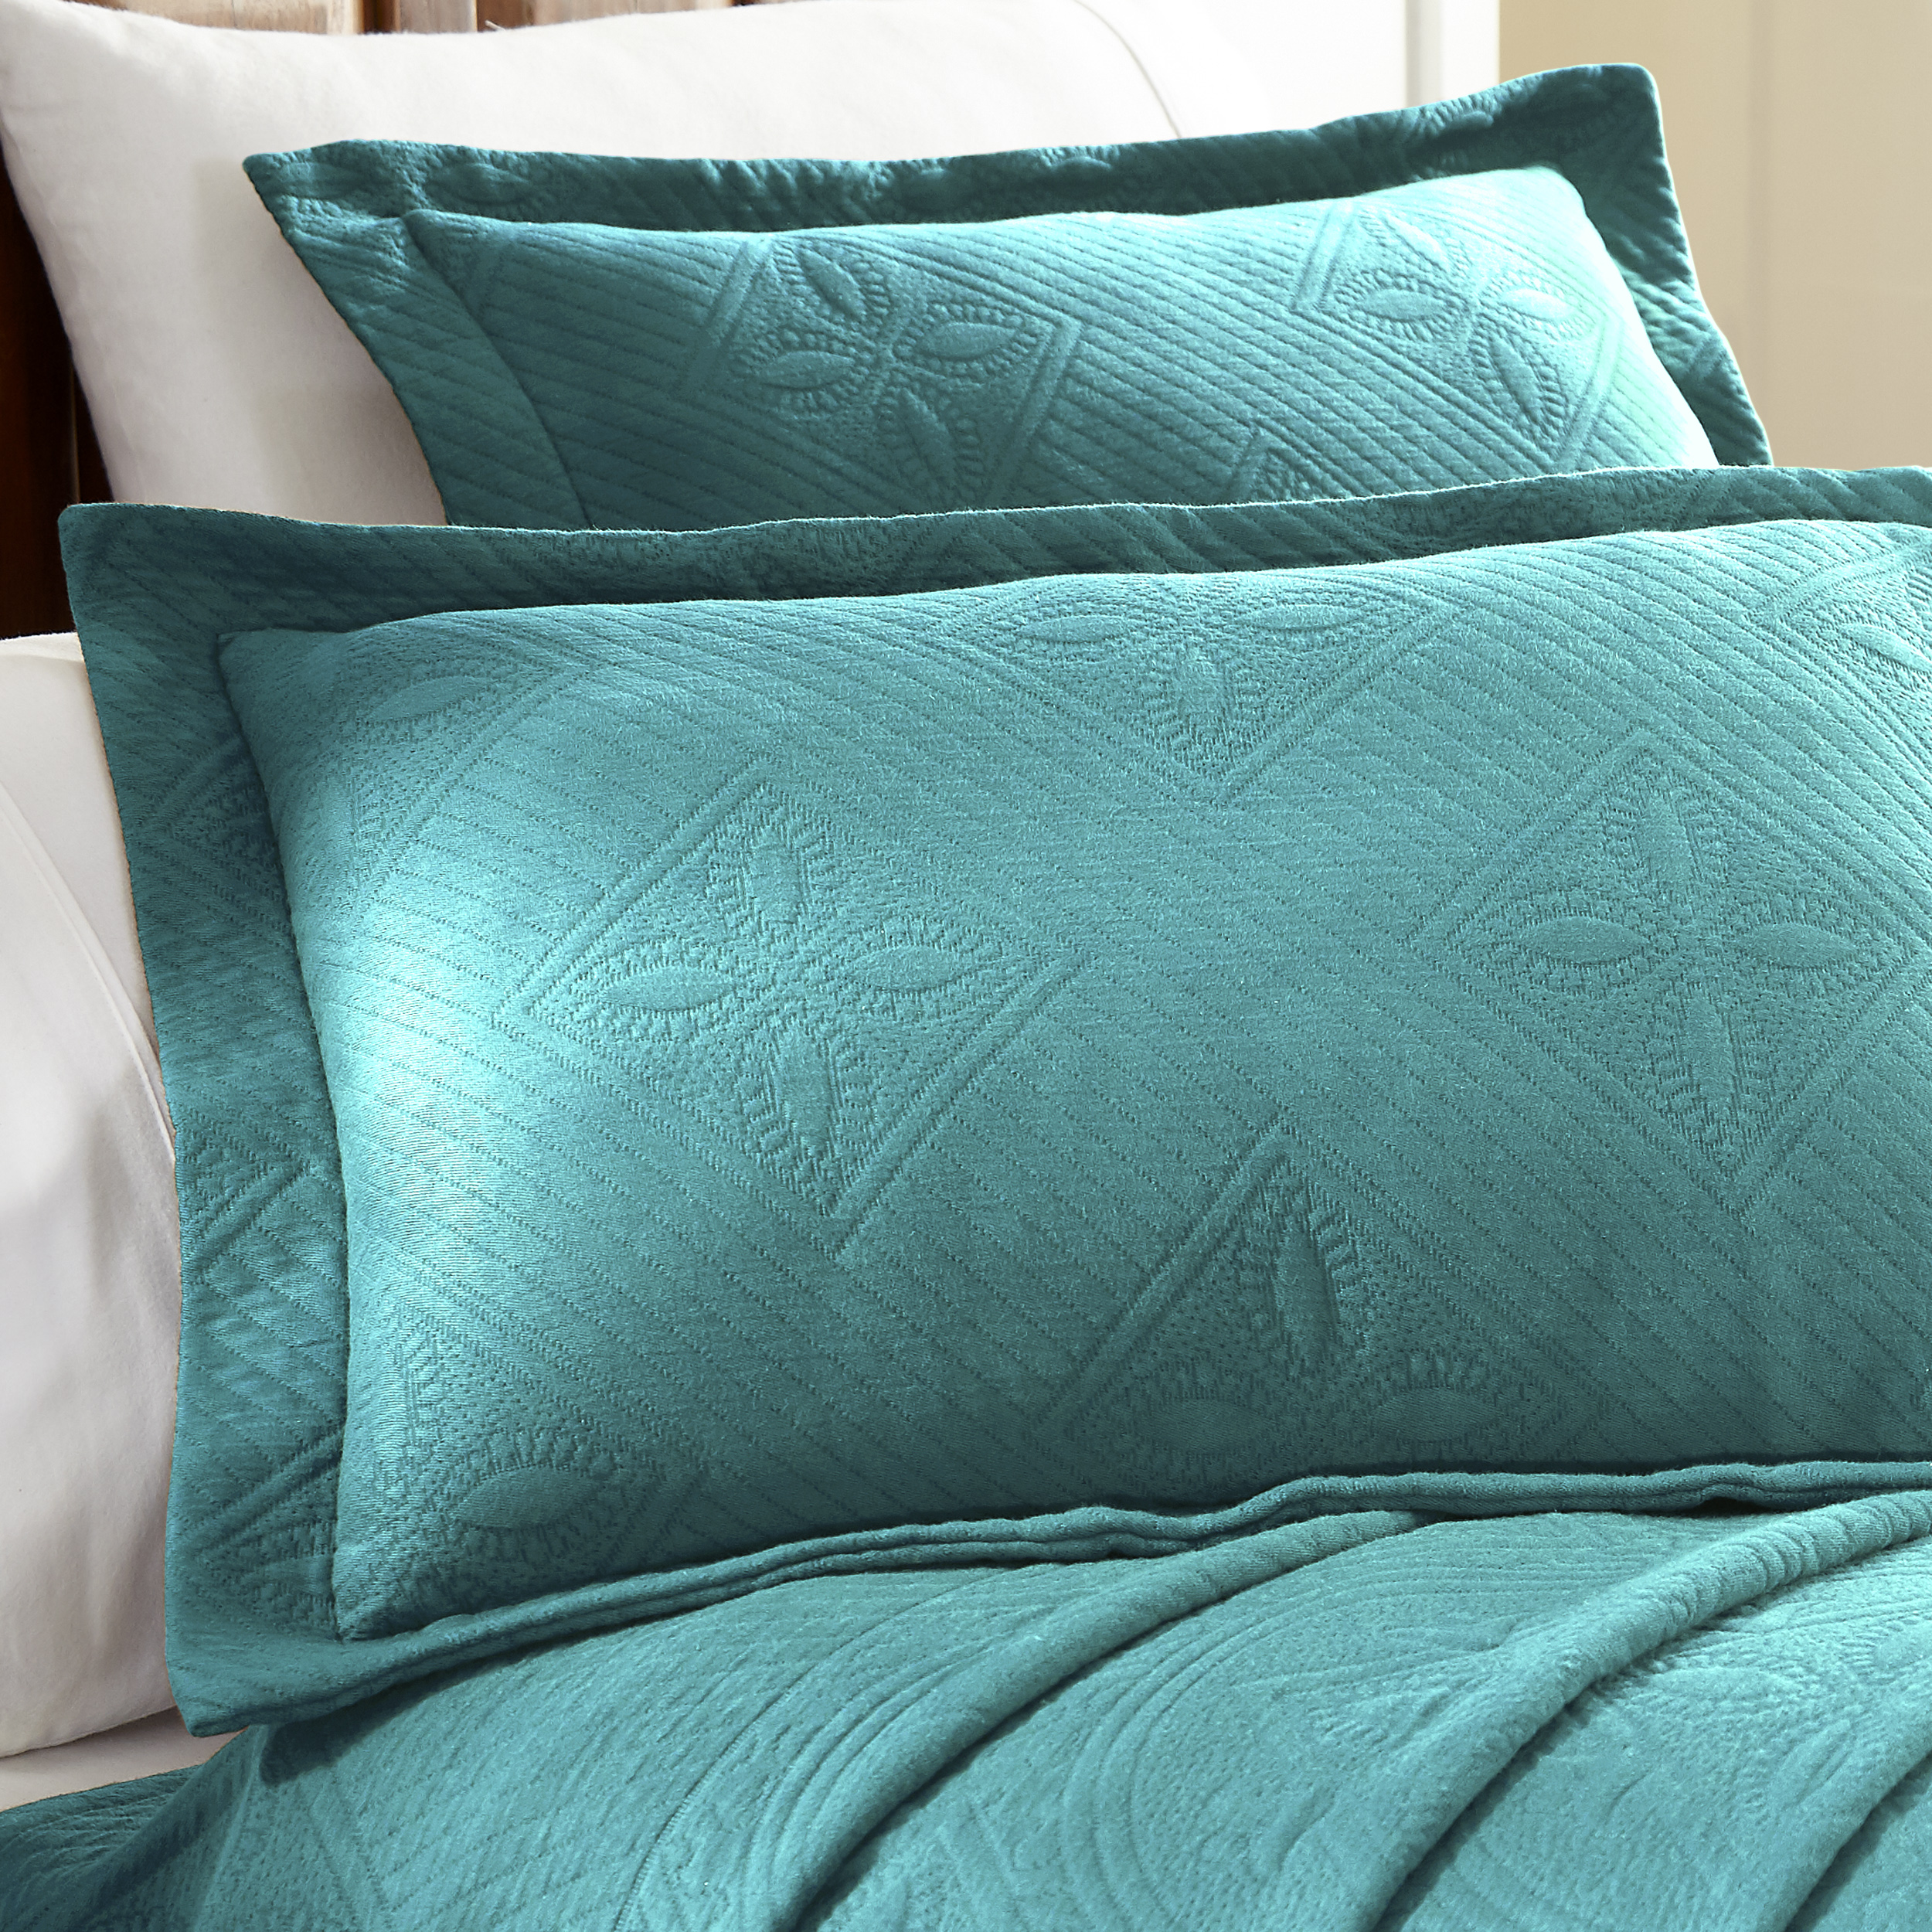 Celtic-Circle-Cotton-Jacquard-Matelasse-Scalloped-Bedspread-Set thumbnail 21